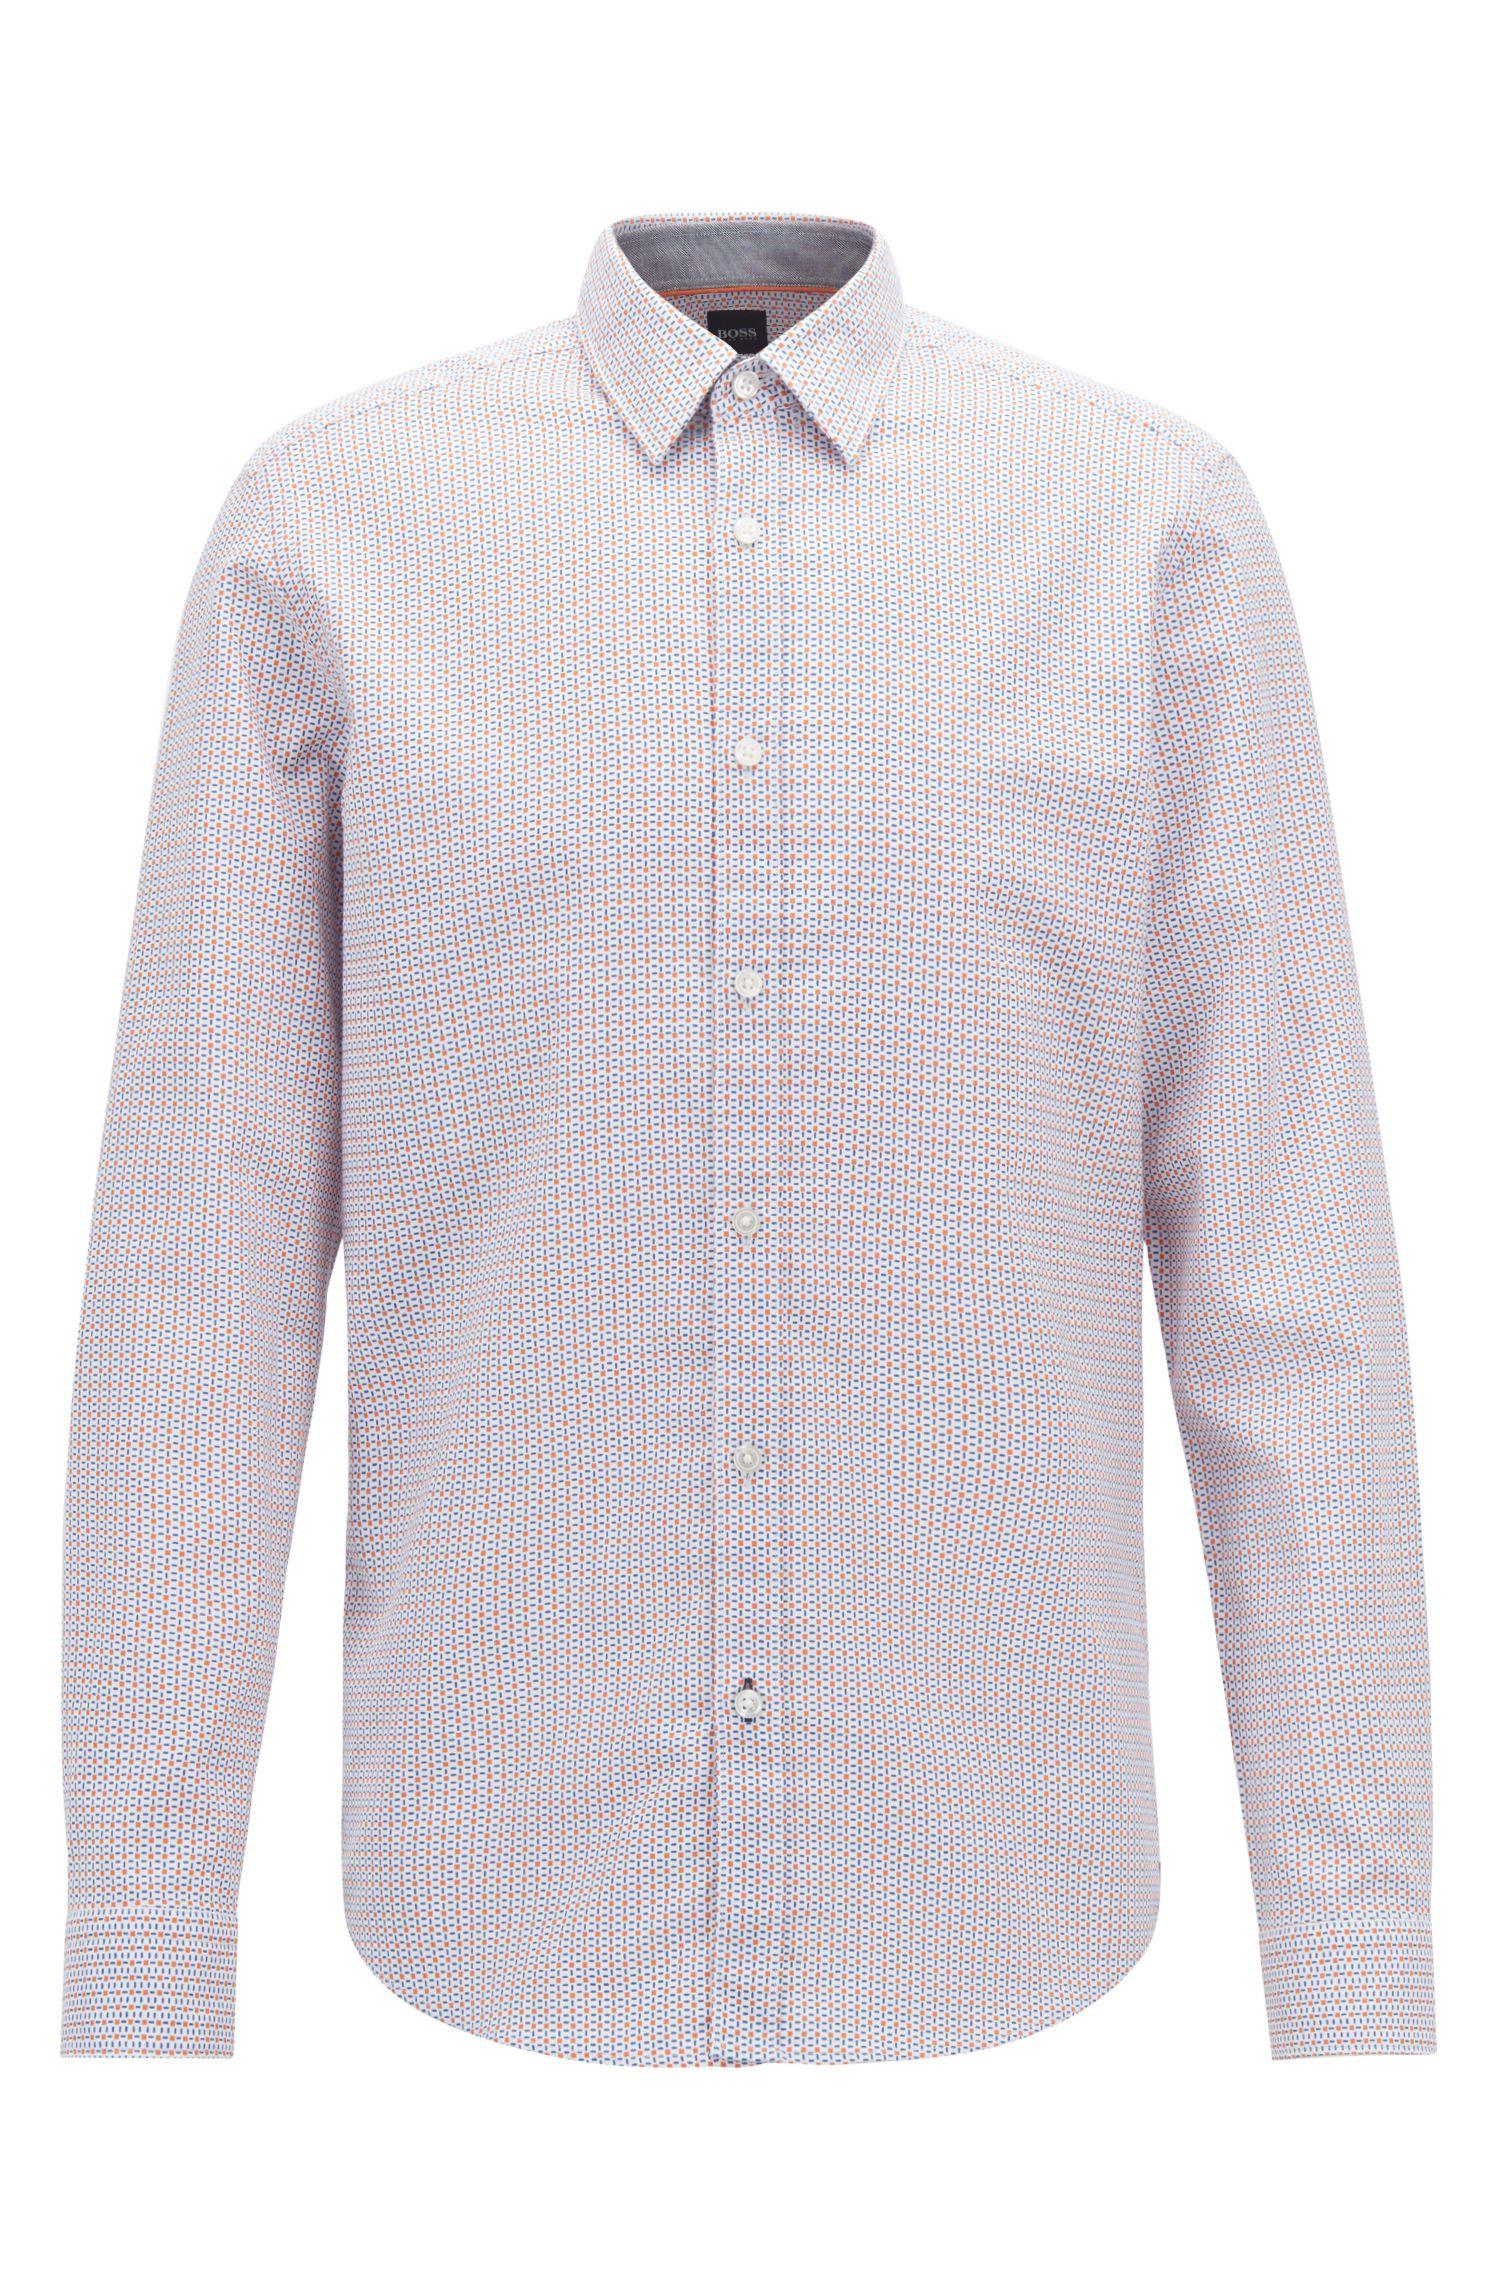 Regular-fit shirt in geometric-print cotton, Orange